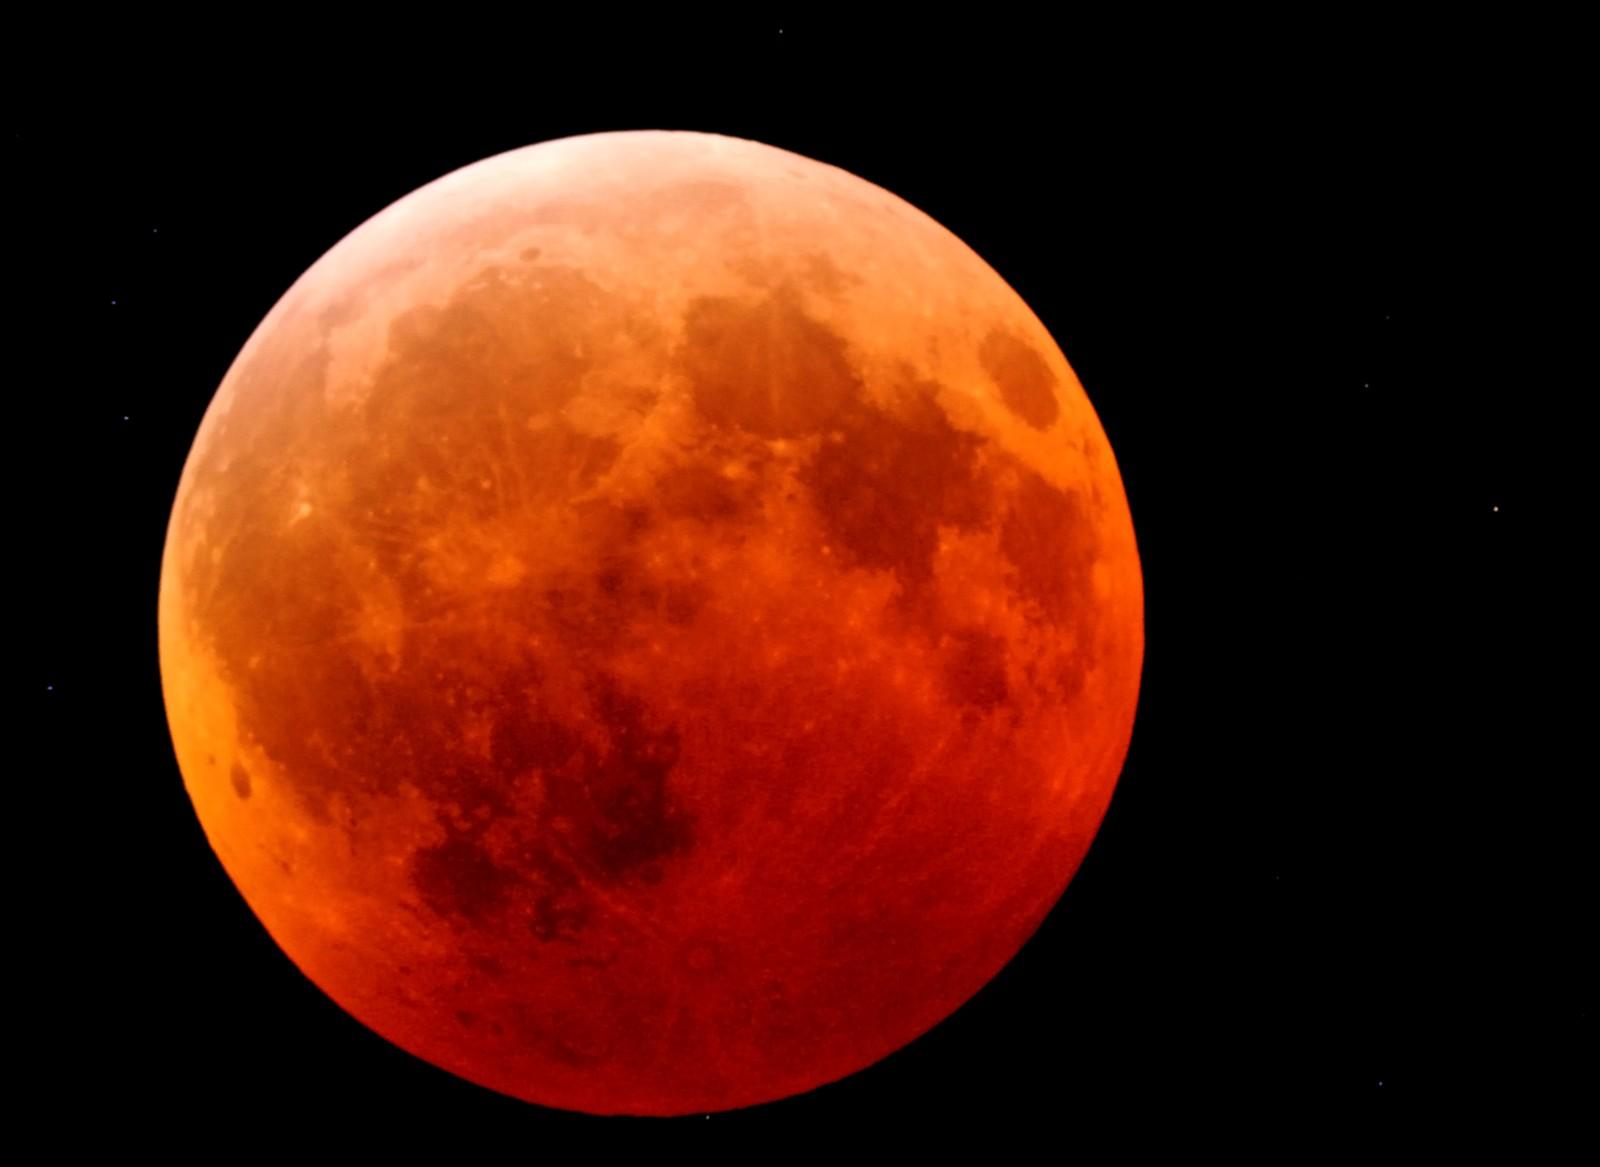 orange moon: Ignacio A Rodriguez: Galleries: Digital ...